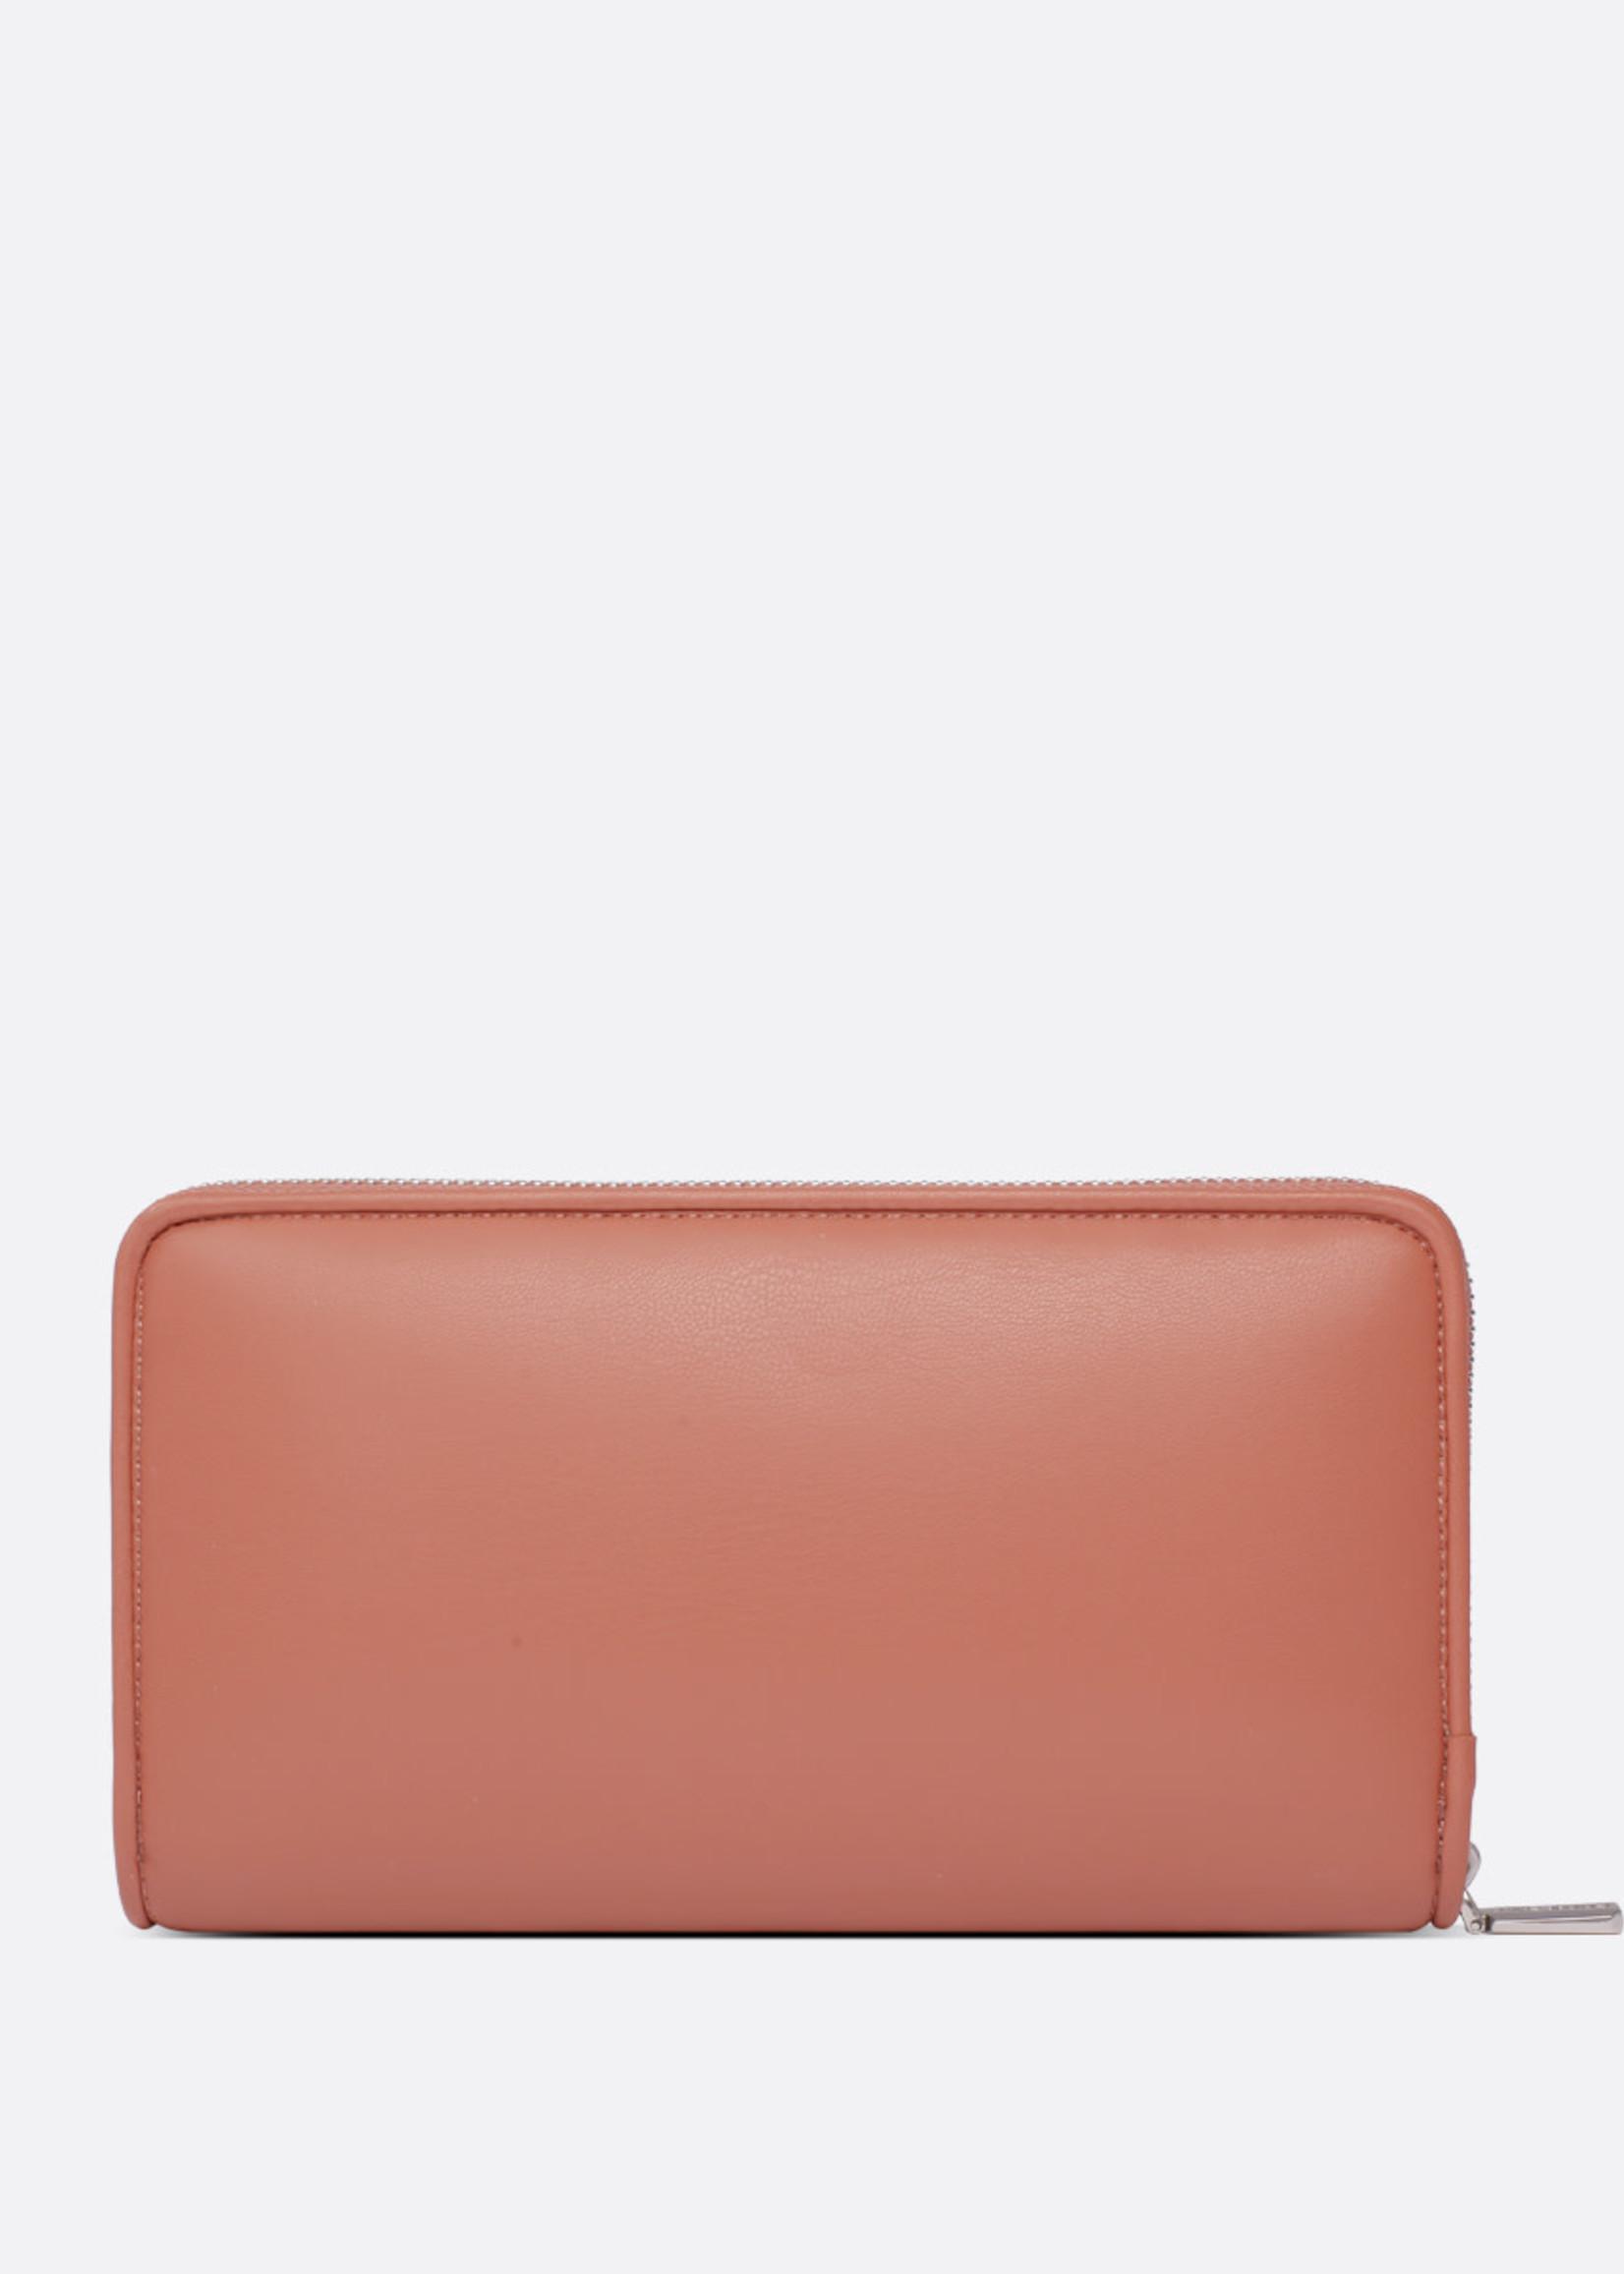 PIXIE MOOD Bubbly Wallet DESERT CLAY